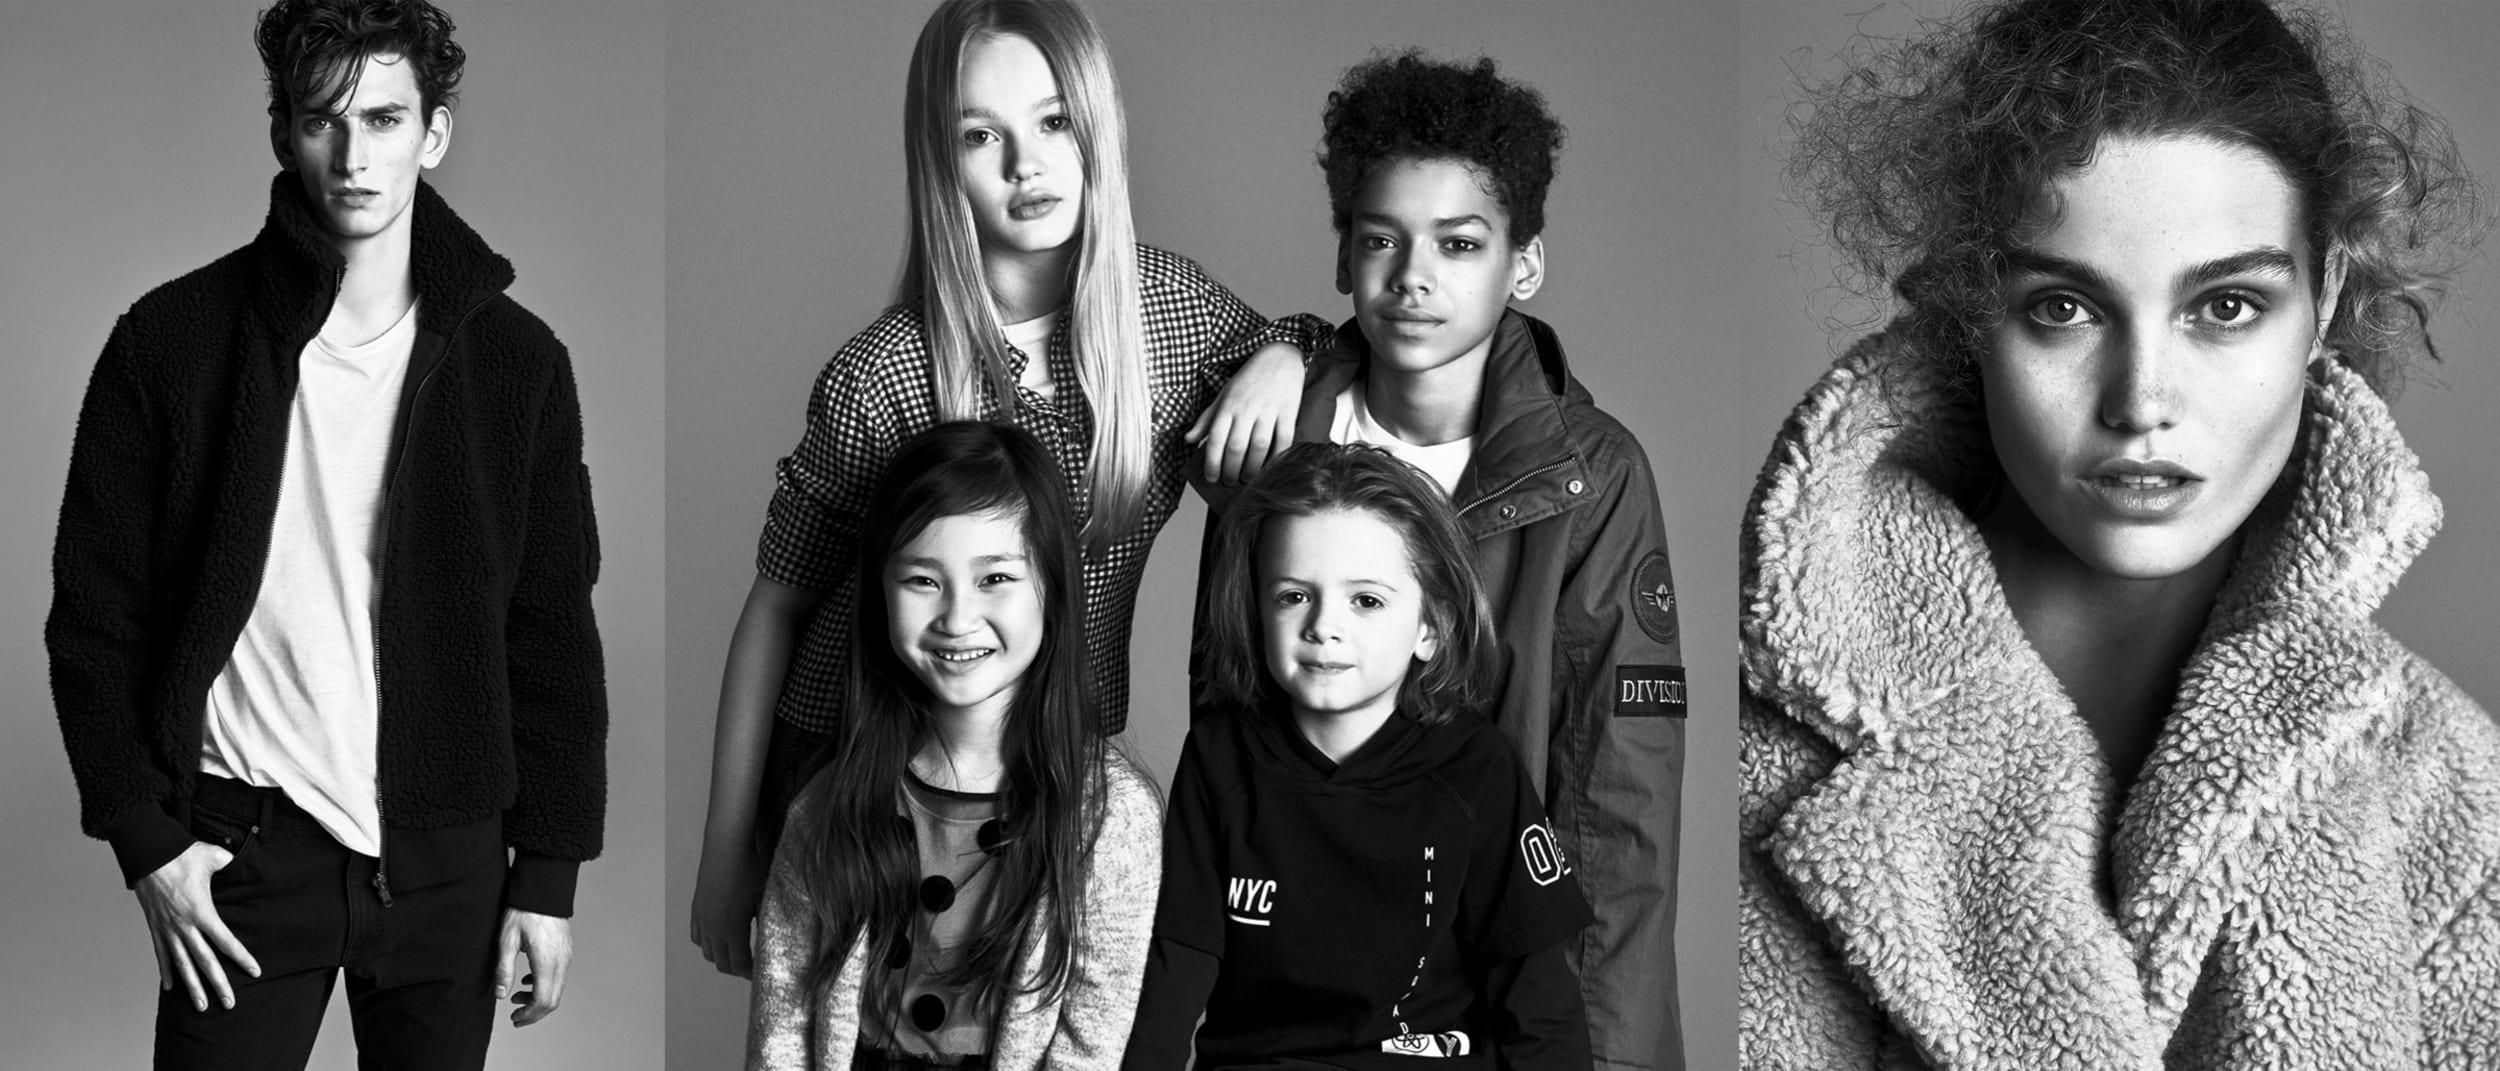 H&M: shop up to 70% OFF women, men's, kids & home